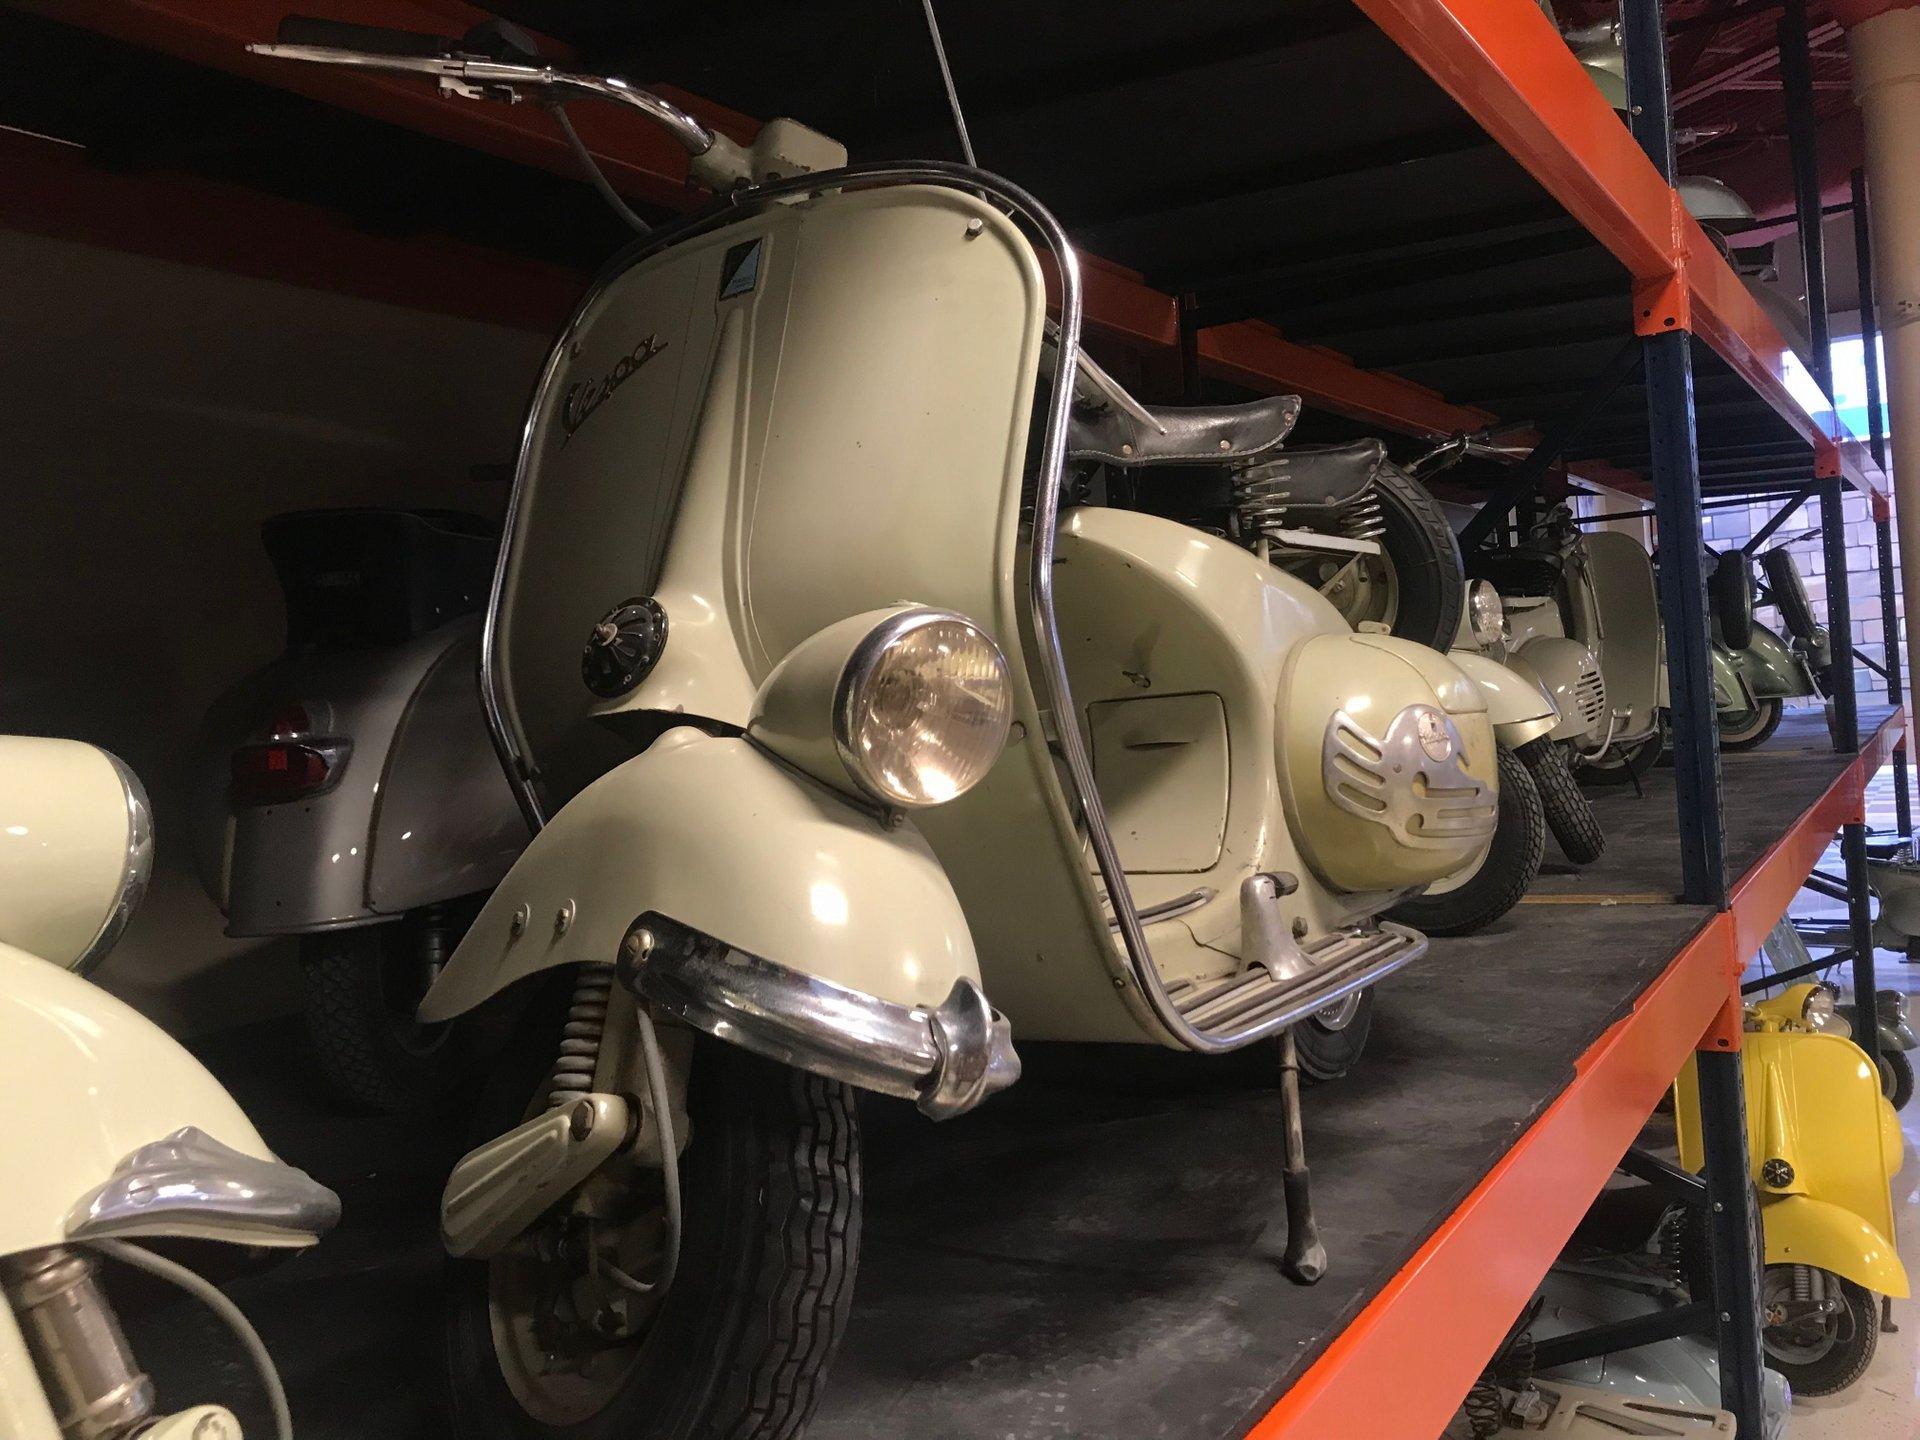 1953 vespa 125 vm1